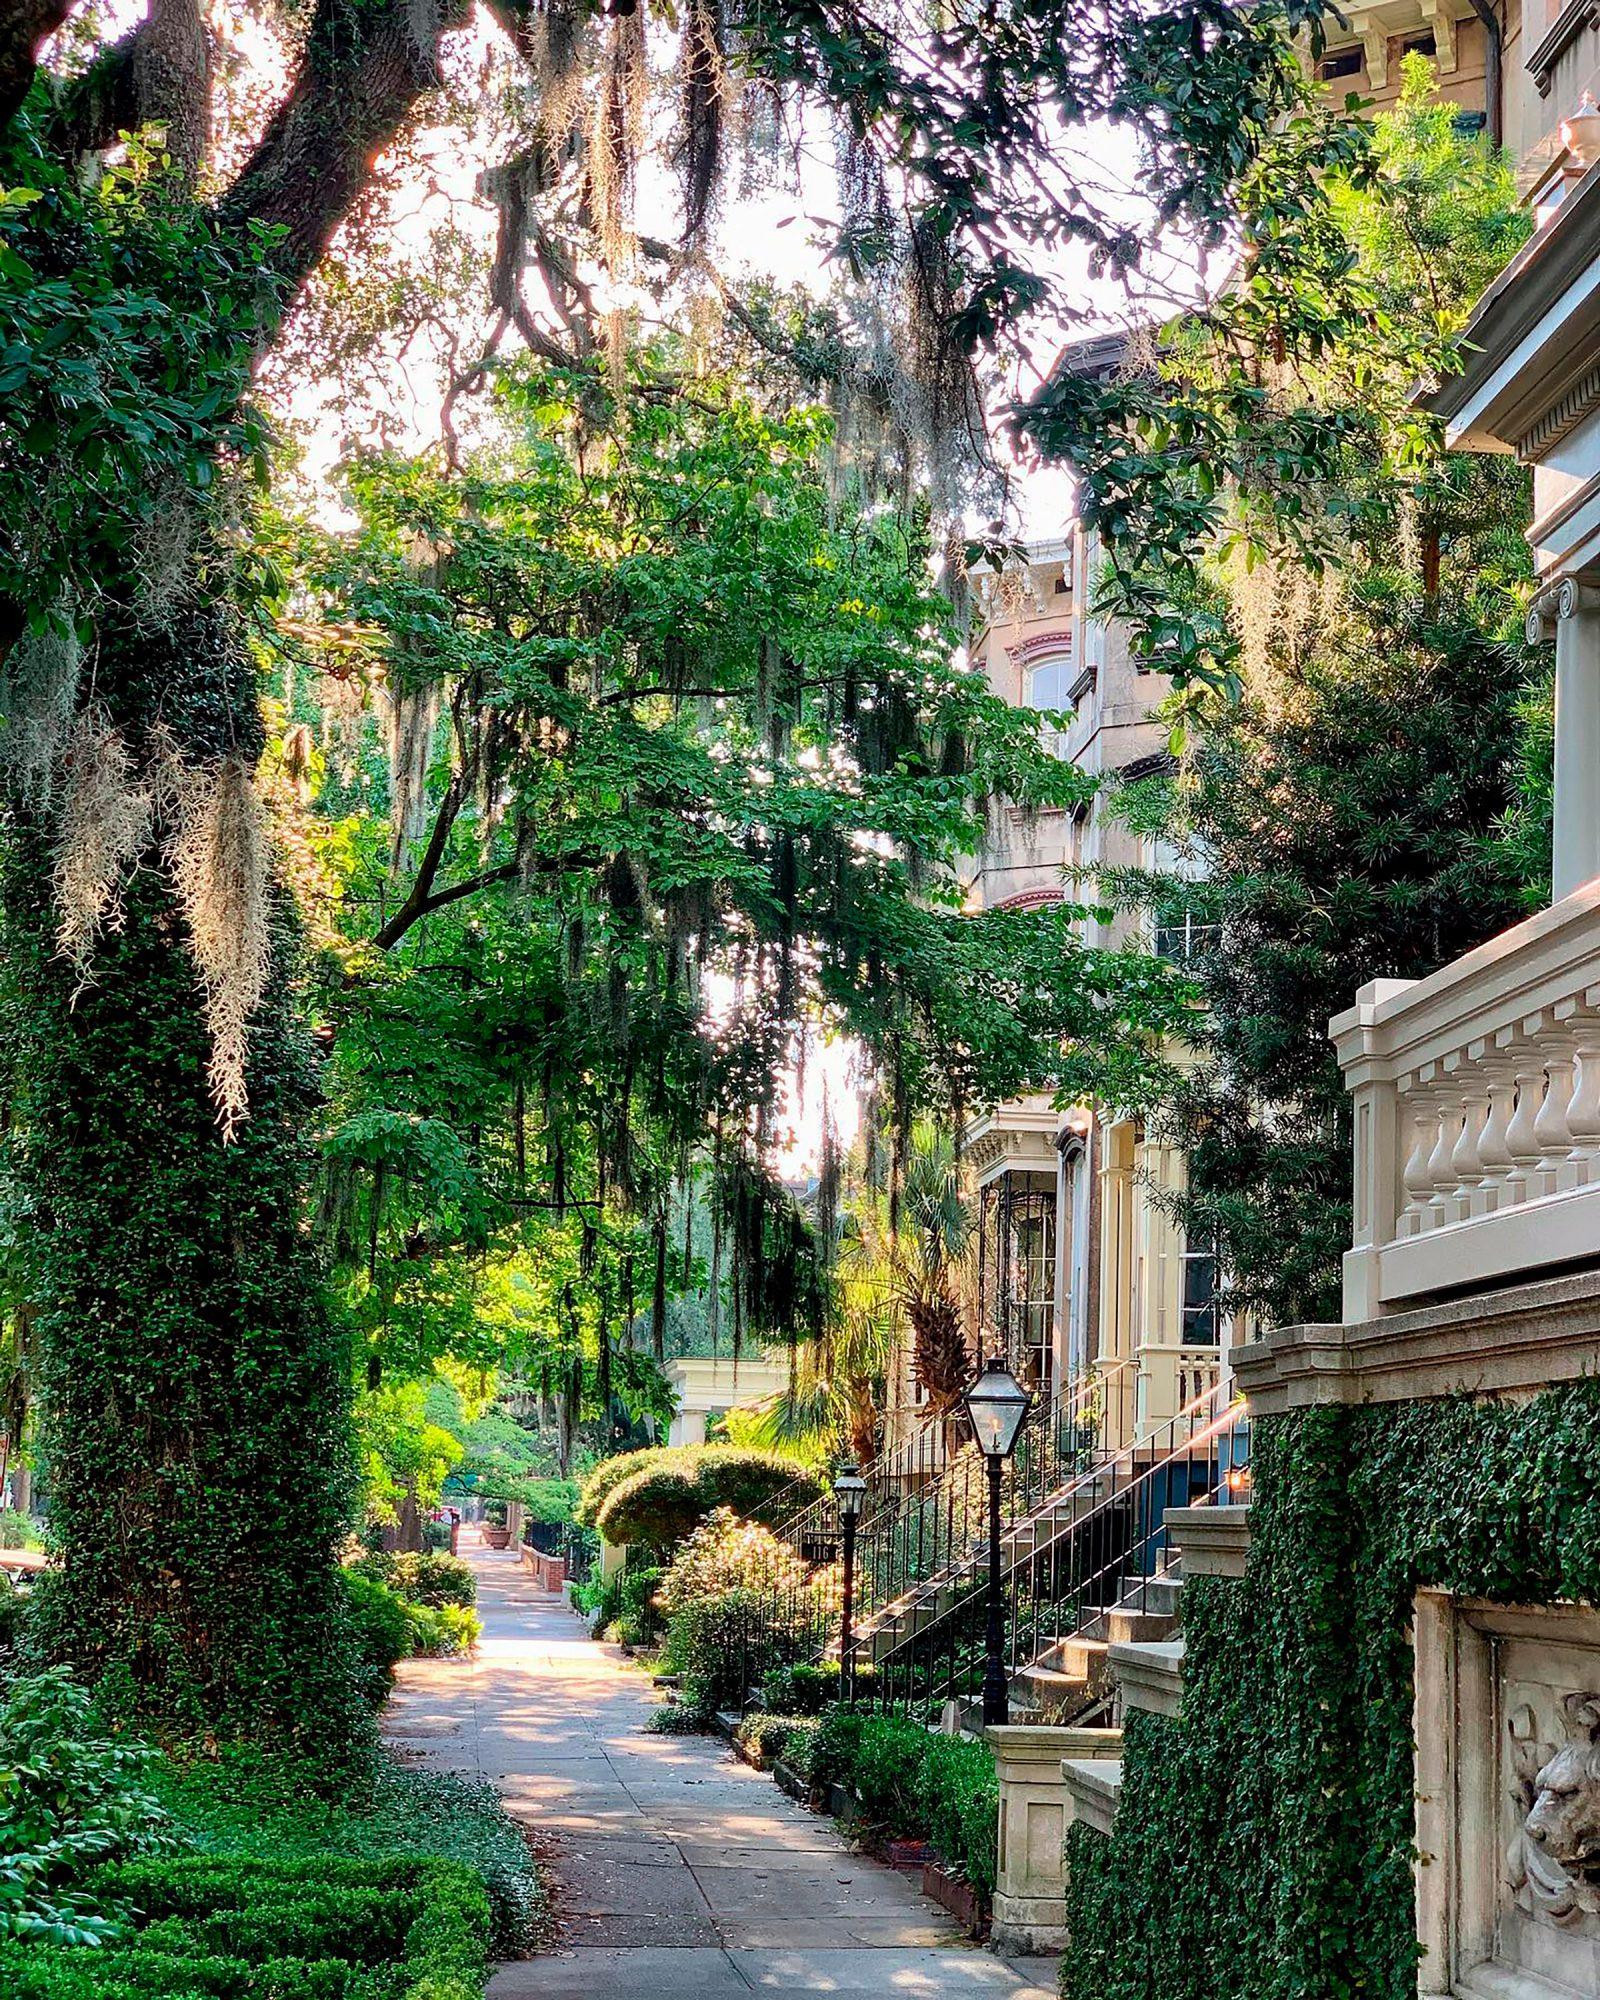 Warm-weather getaway to Savannah, Georgia